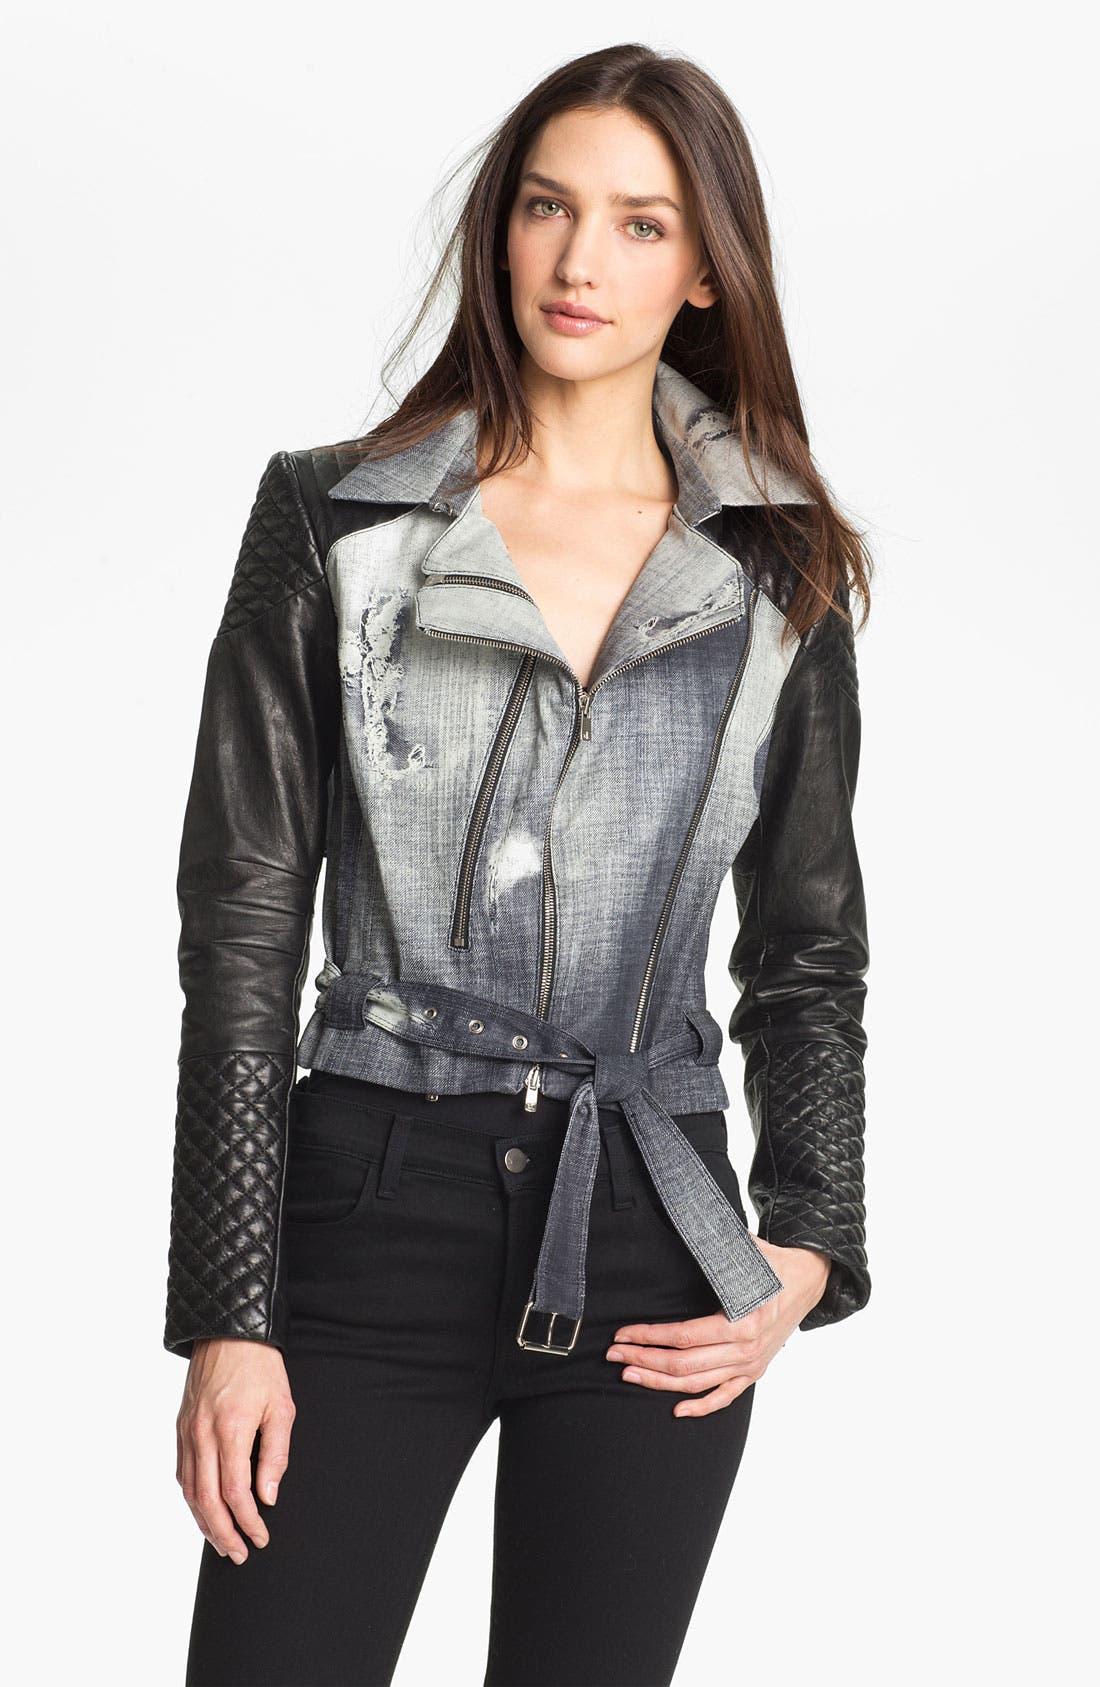 Alternate Image 1 Selected - Rebecca Minkoff 'Kiefer' Leather Sleeve Biker Jacket